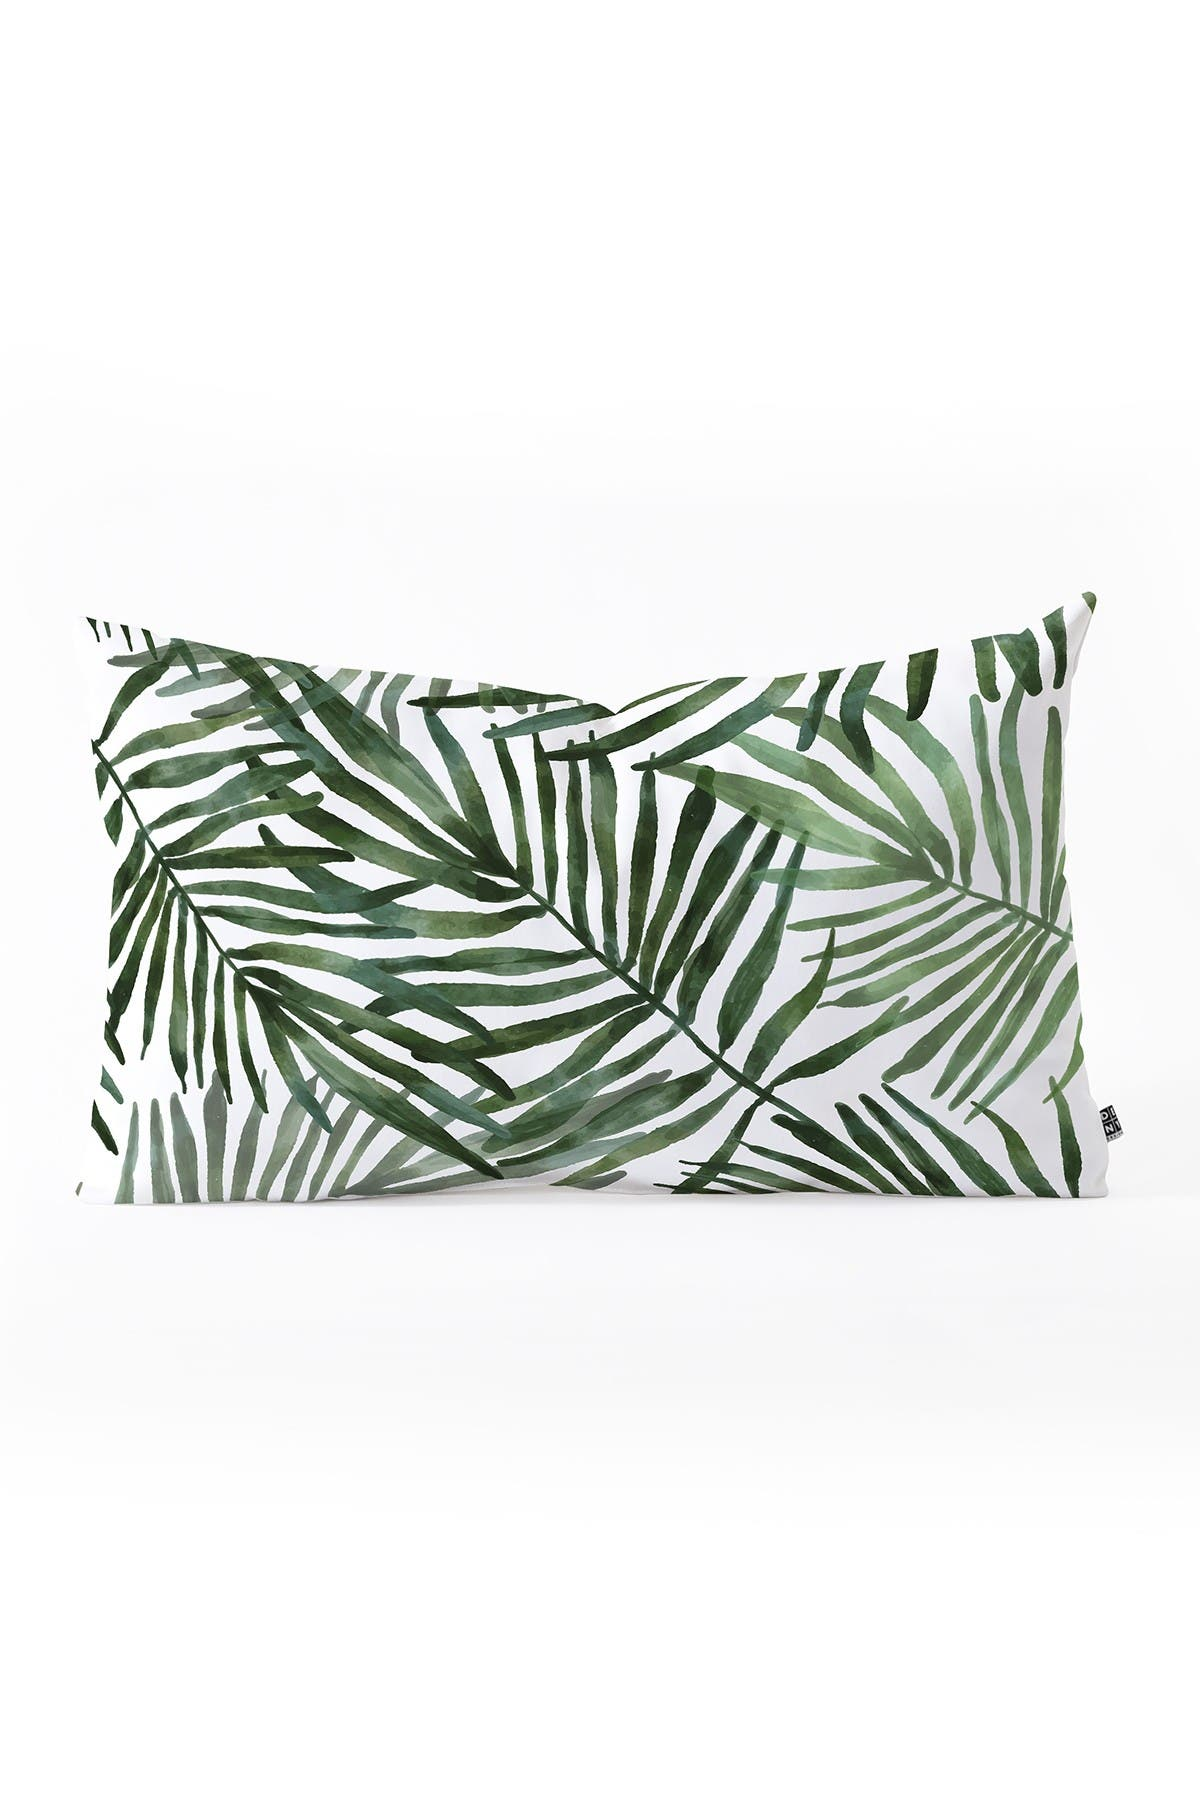 Image of Deny Designs Marta Barragan Camarasa Watercolor simple leaves Oblong Throw Pillow